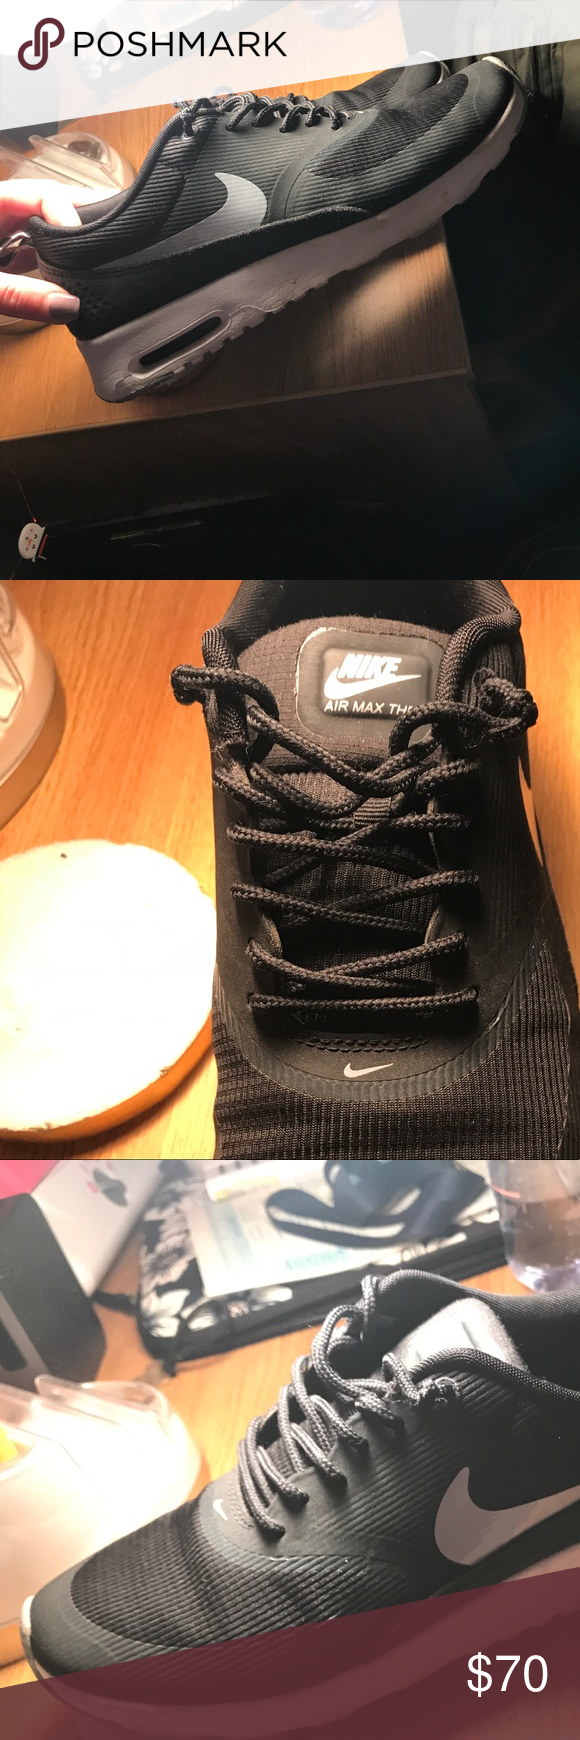 pretty nice a6187 8db2e 3 Best Nike Air Max 97 Sneakers (January 2018) RunRepeat